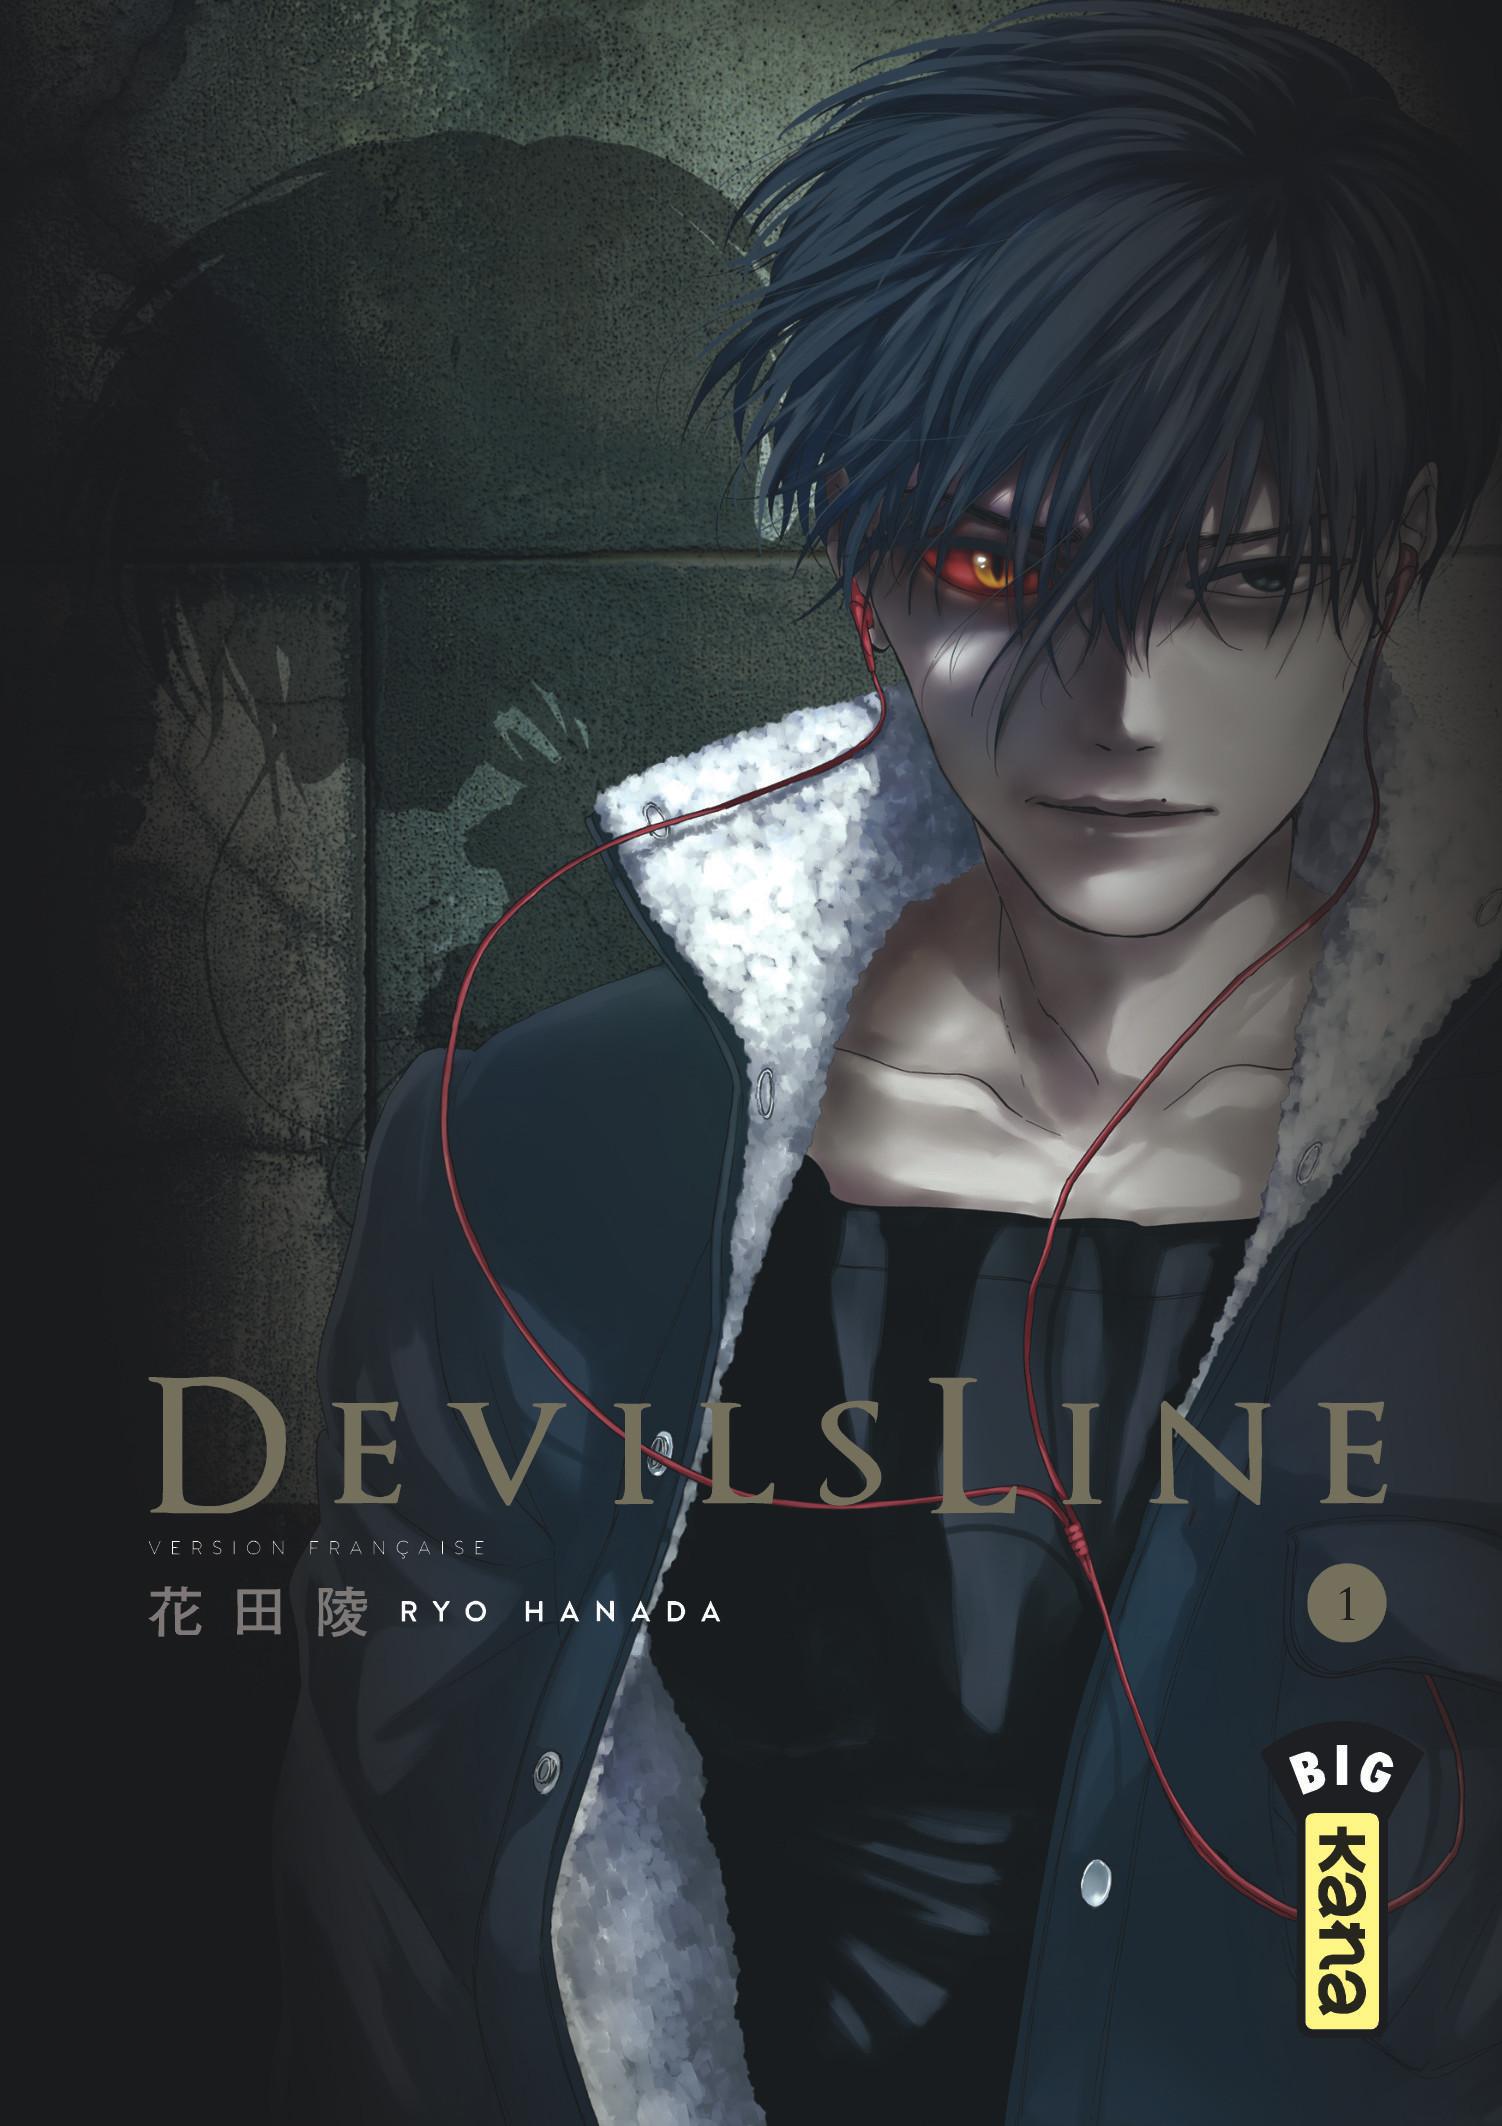 [ MANGA / ANIME ] Devil's Line // DevilsLine Devilsline-manga-volume-1-simple-232310